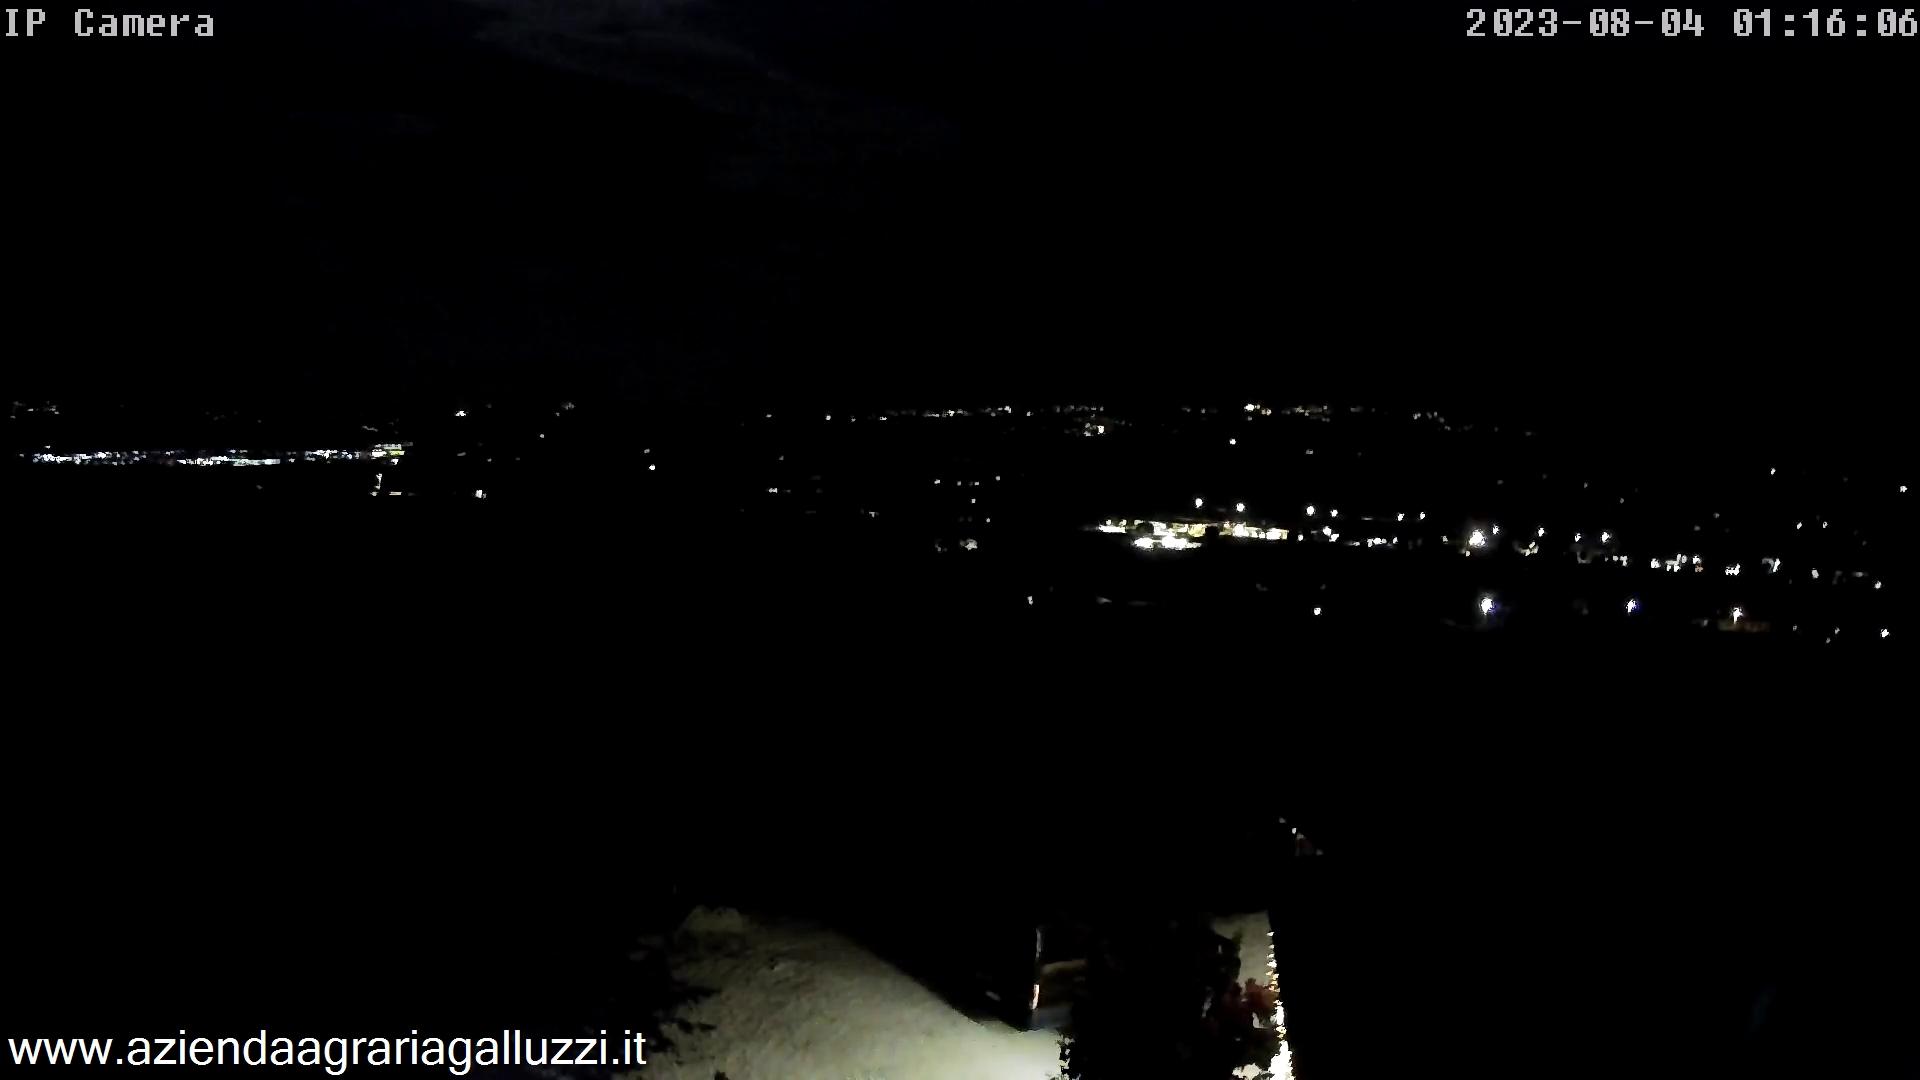 Webcam Castelfidardo - Azienda Agraria Galluzzi